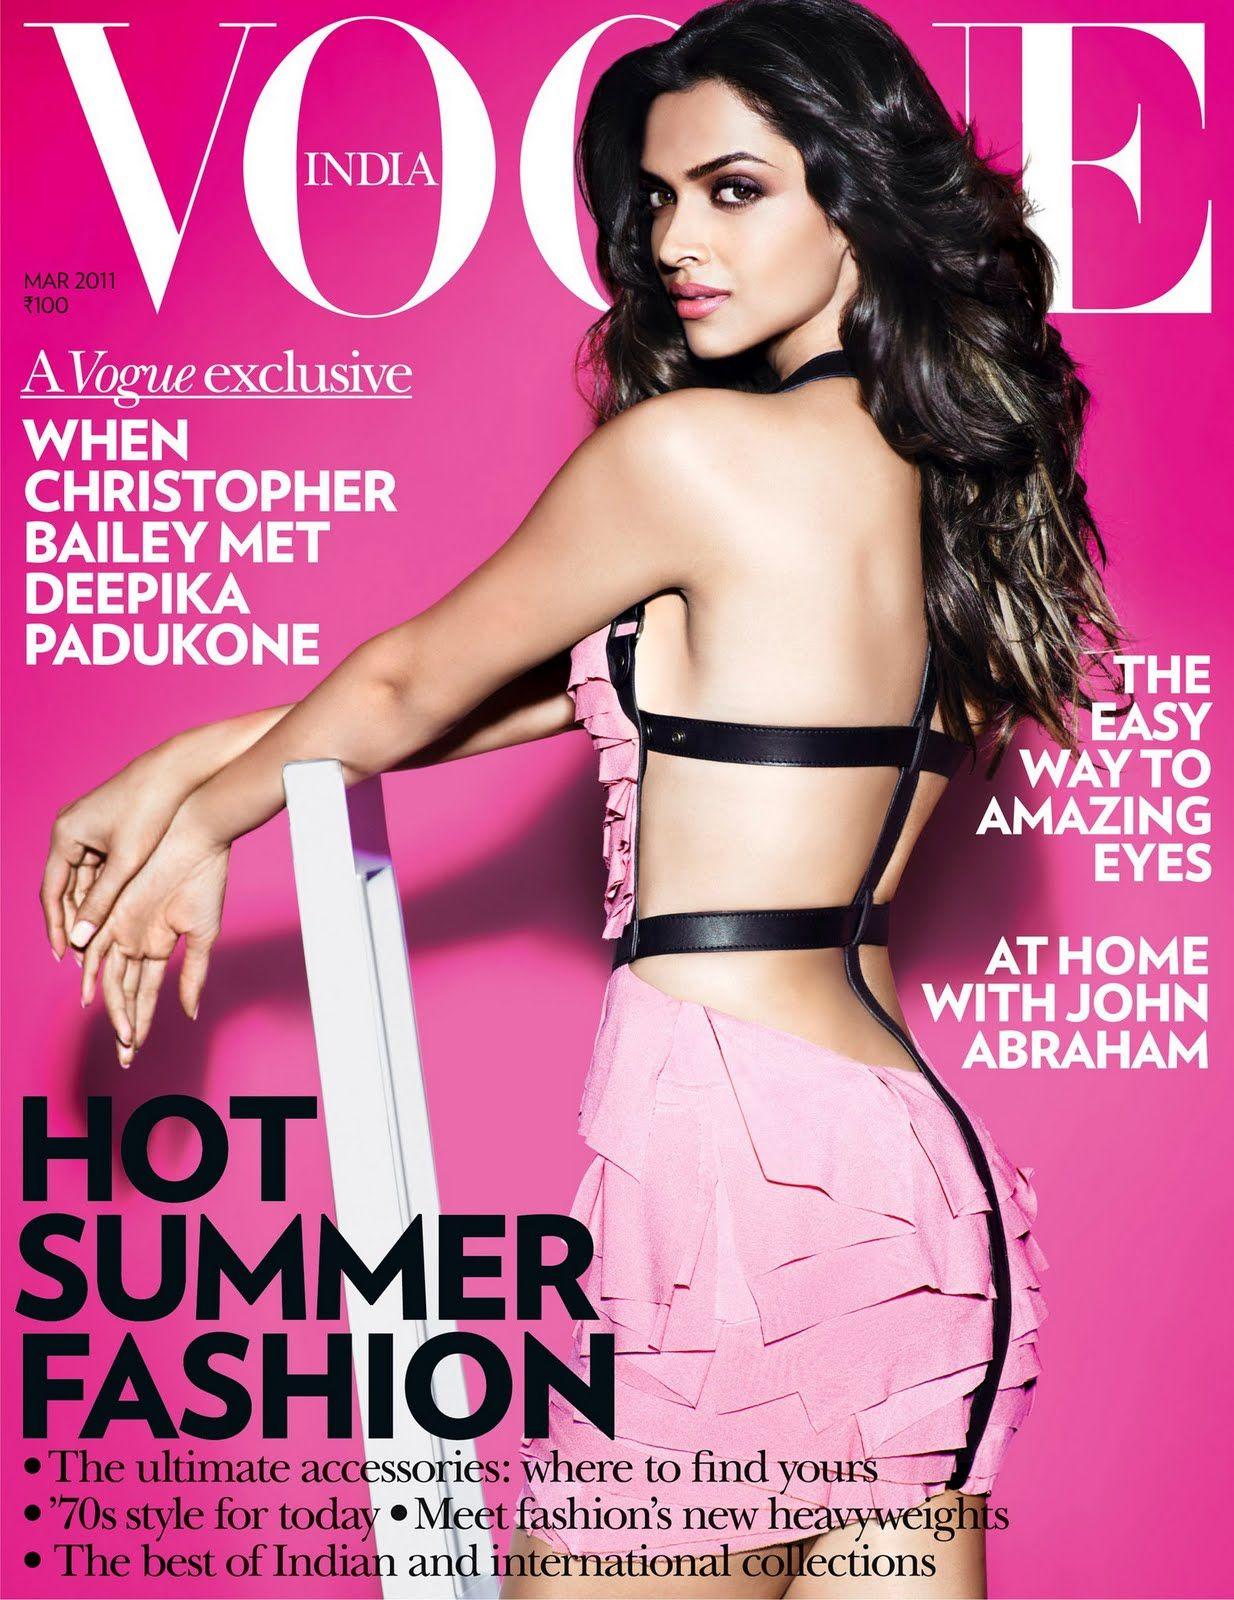 Deepika Padukone On Vogue India Magazine March 2011 In 2020 Deepika Padukone Vogue India Deepika Padukone Hot